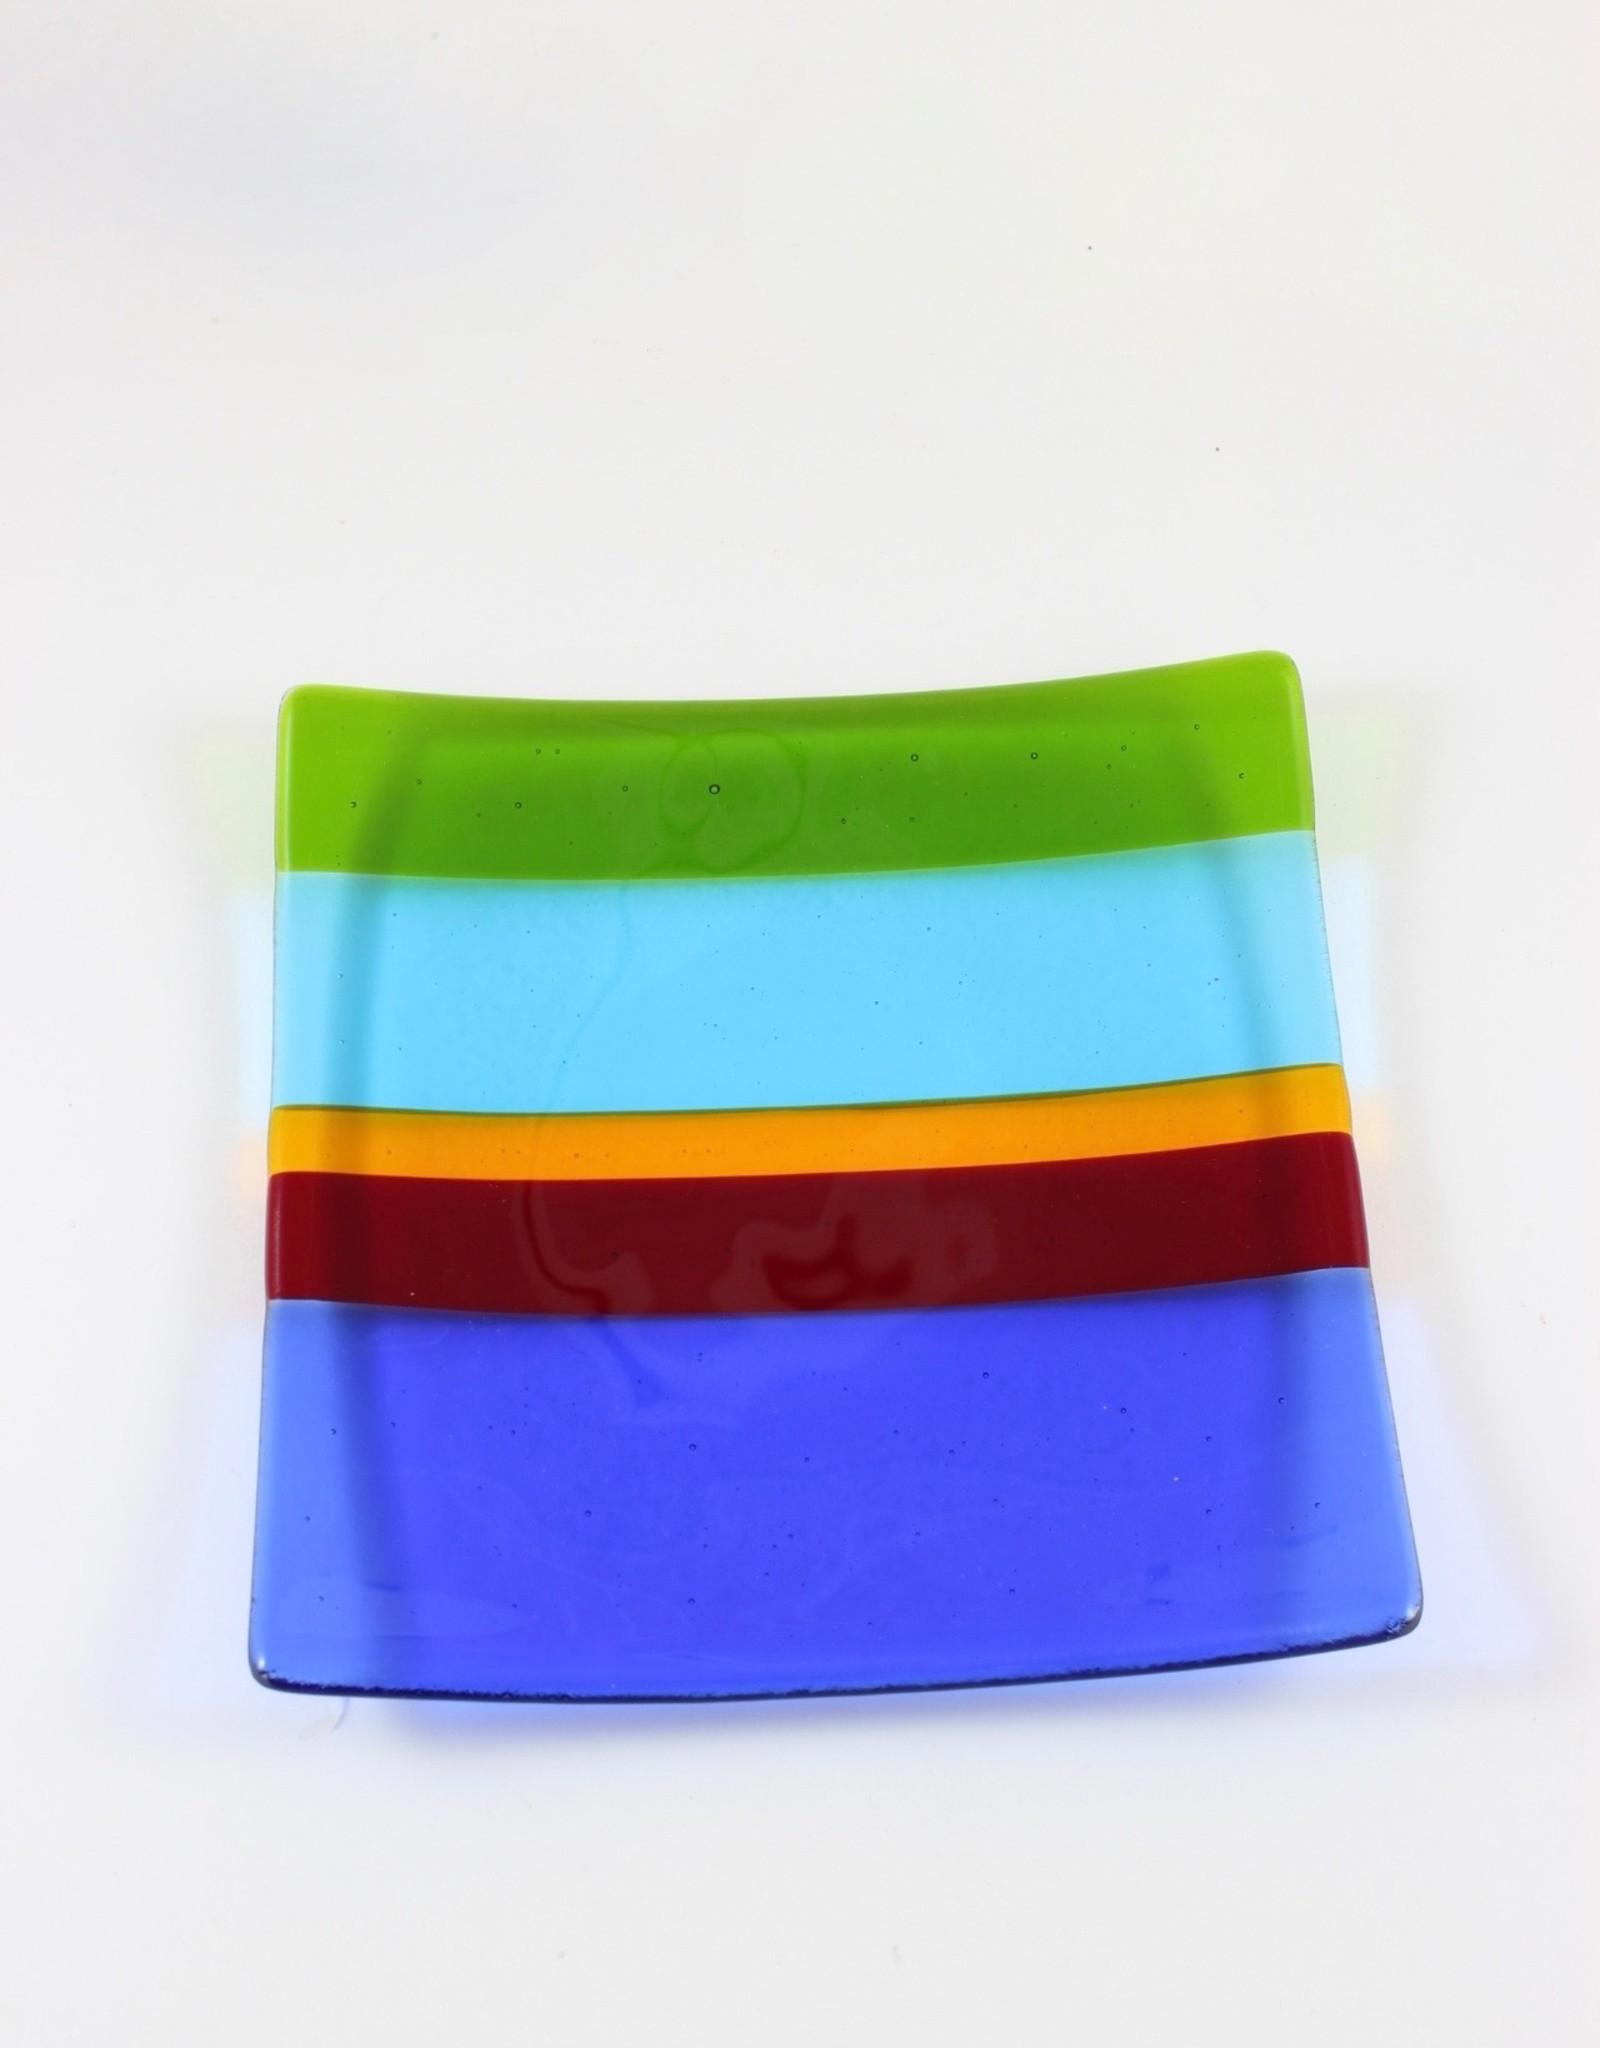 Bonnie Brugger Sushi Plate by Bonnie Brugger